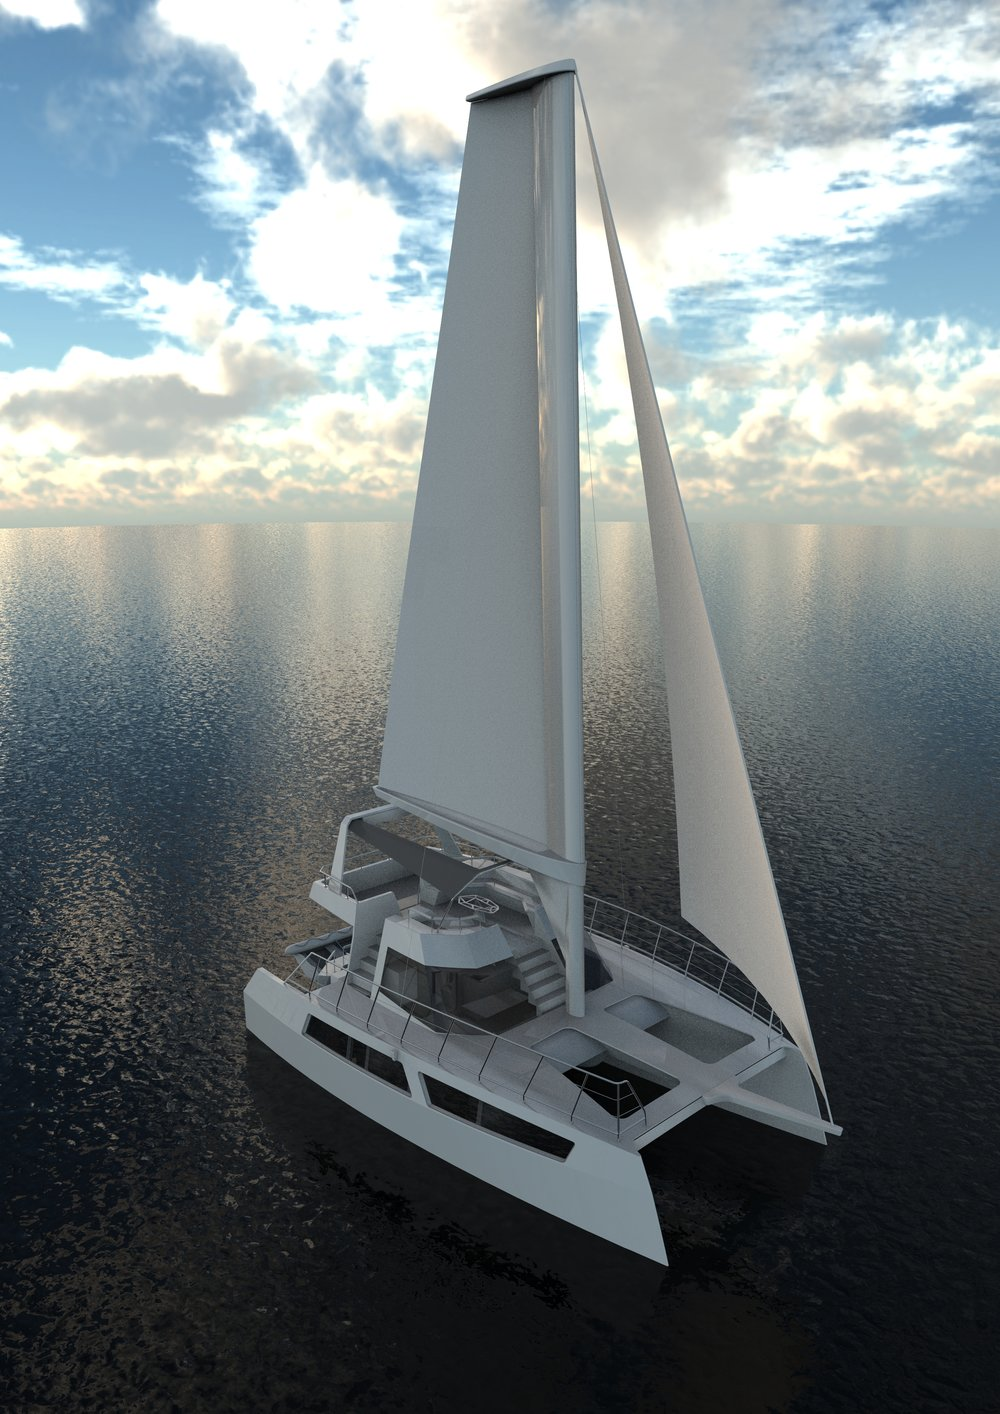 SAPPHIRE 40 Sailing Catamaran